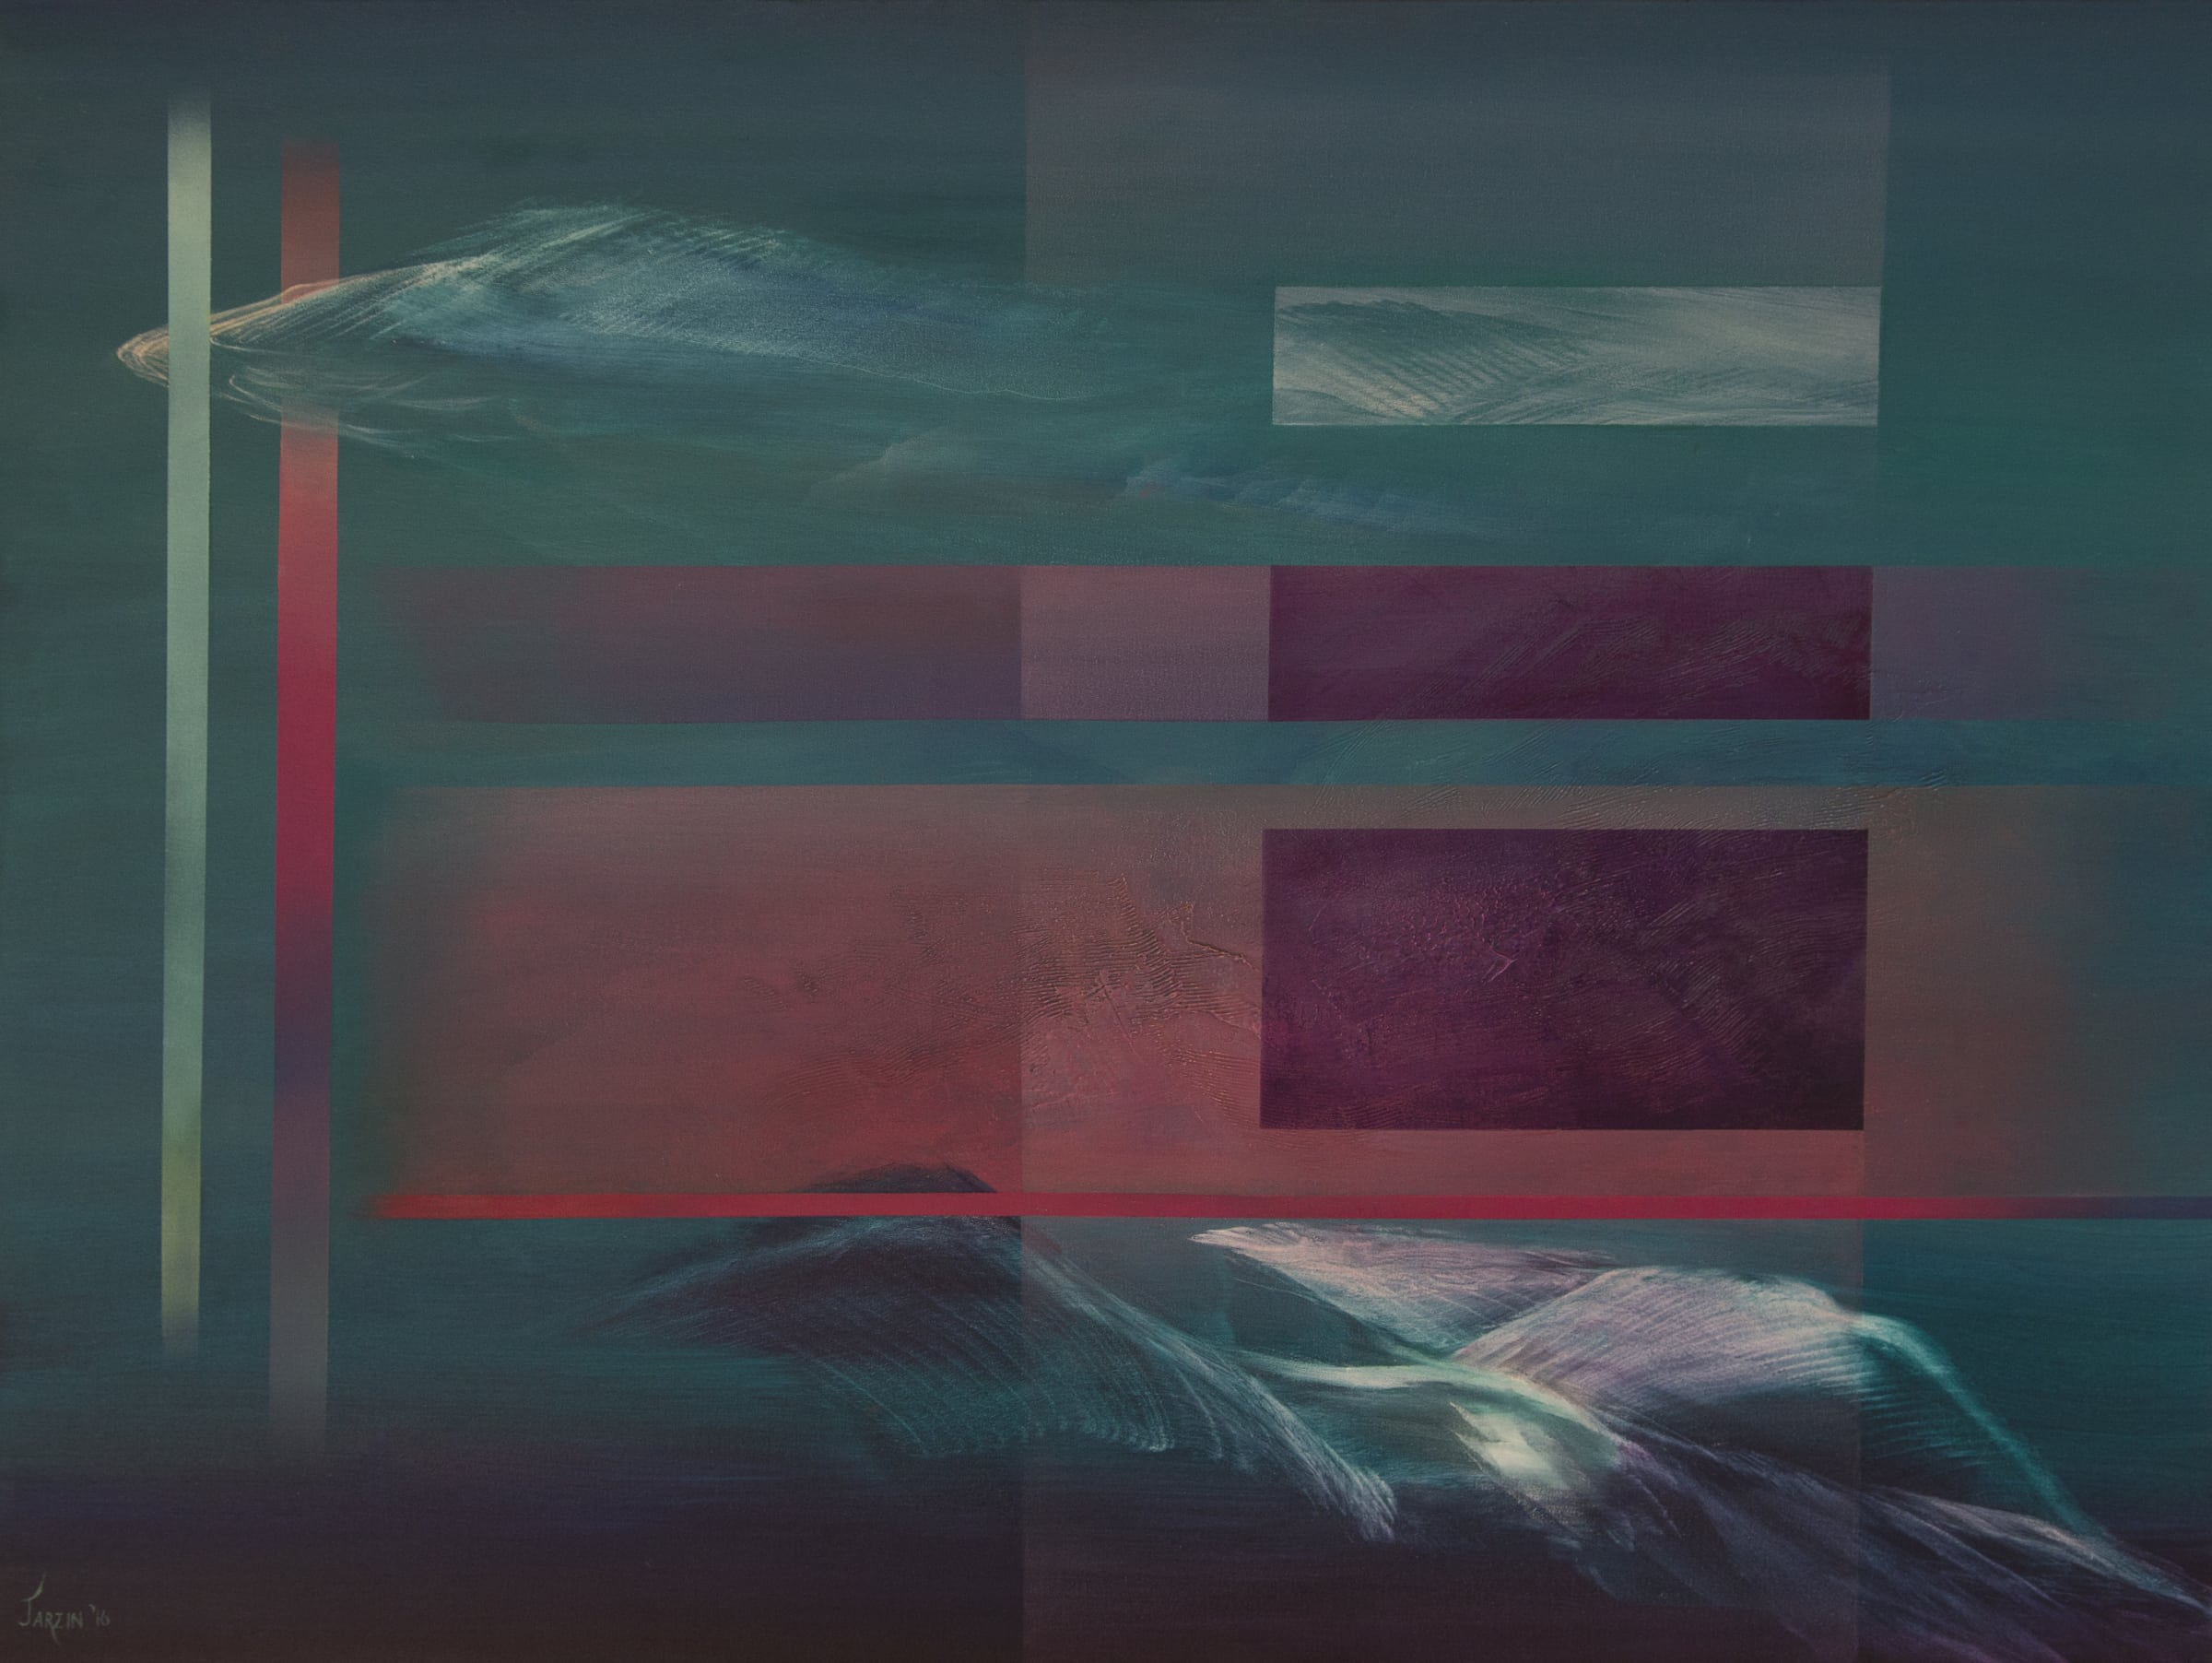 <span class=&#34;link fancybox-details-link&#34;><a href=&#34;/artists/44-sheila-jarzin/works/1018-sheila-jarzin-seascape-3-2016/&#34;>View Detail Page</a></span><div class=&#34;artist&#34;><strong>Sheila Jarzin</strong></div> <div class=&#34;title&#34;><em>Seascape 3</em>, 2016</div> <div class=&#34;medium&#34;>Oil on Canvas</div> <div class=&#34;dimensions&#34;>76cm x 102cm</div><div class=&#34;price&#34;>R11,200.00</div>